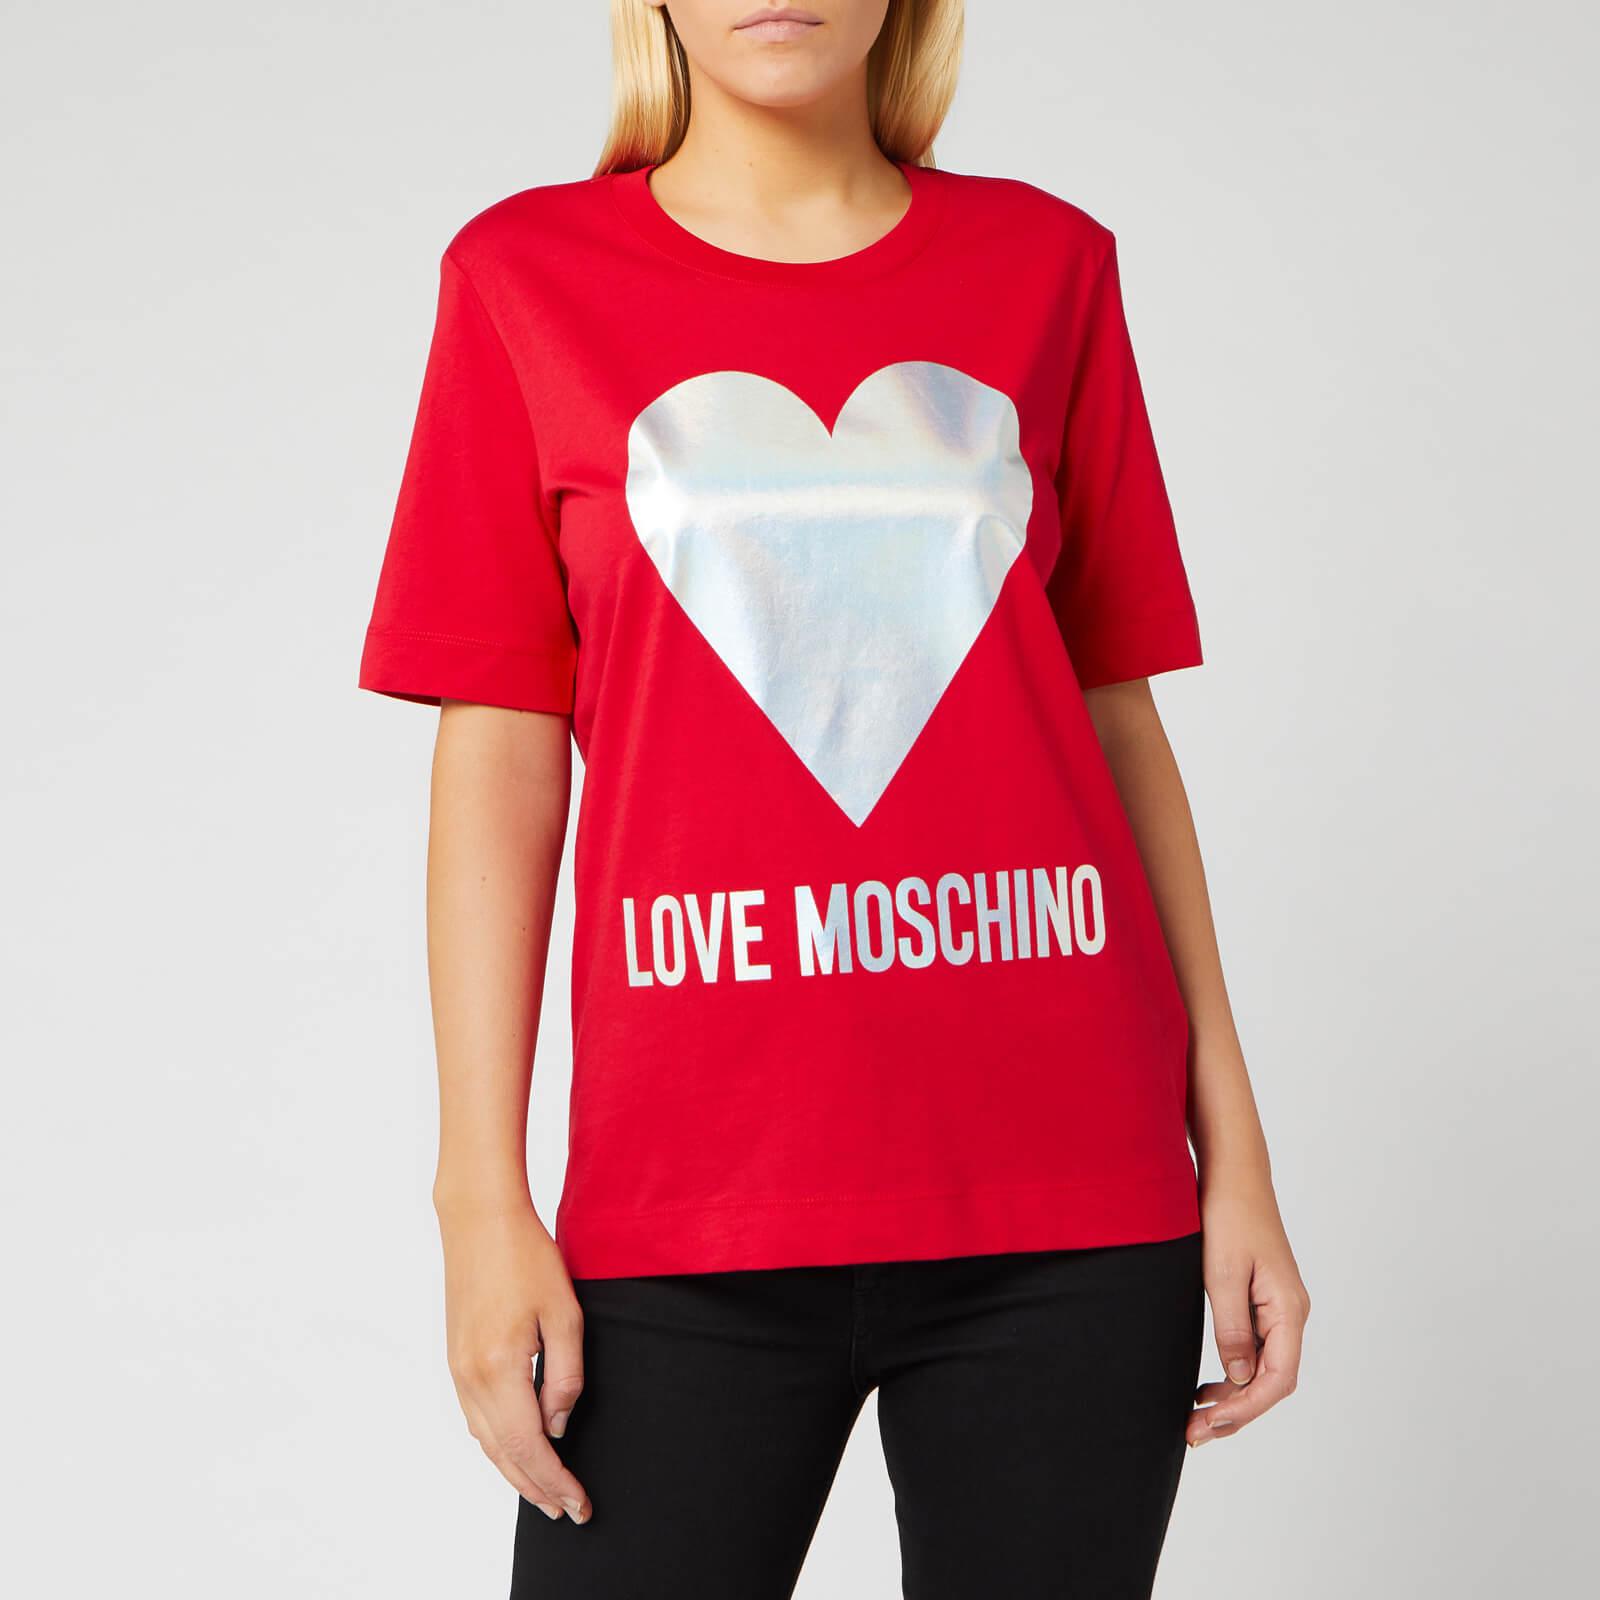 Moschino Love Moschino Women's Silver Heart T-Shirt - Red - IT 42/UK 10